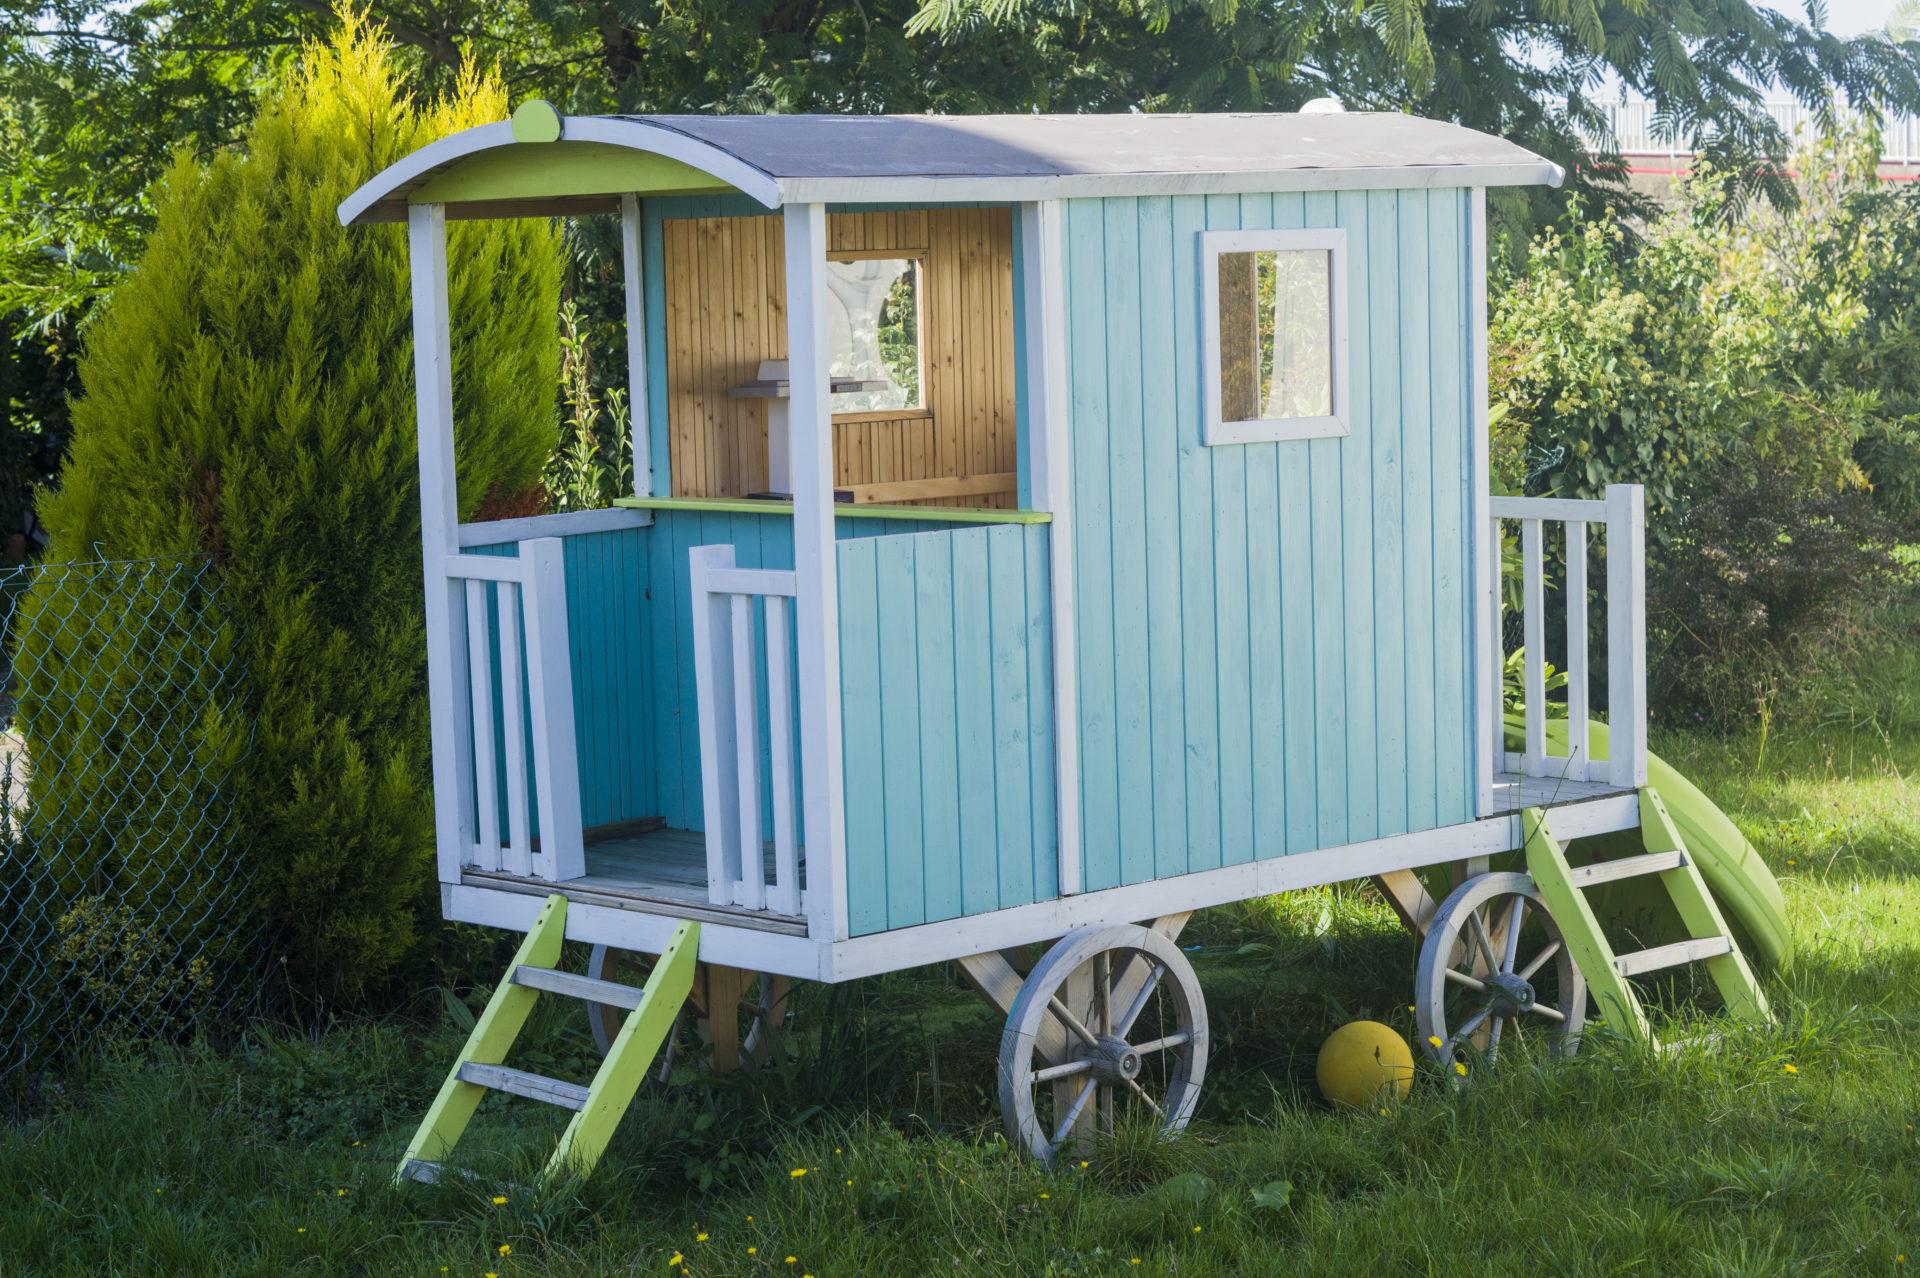 Cabane En Bois Pour Enfant, Cabane Jardin Enfant - Acheter ... serapportantà Cabane De Jardin Enfant Pas Cher